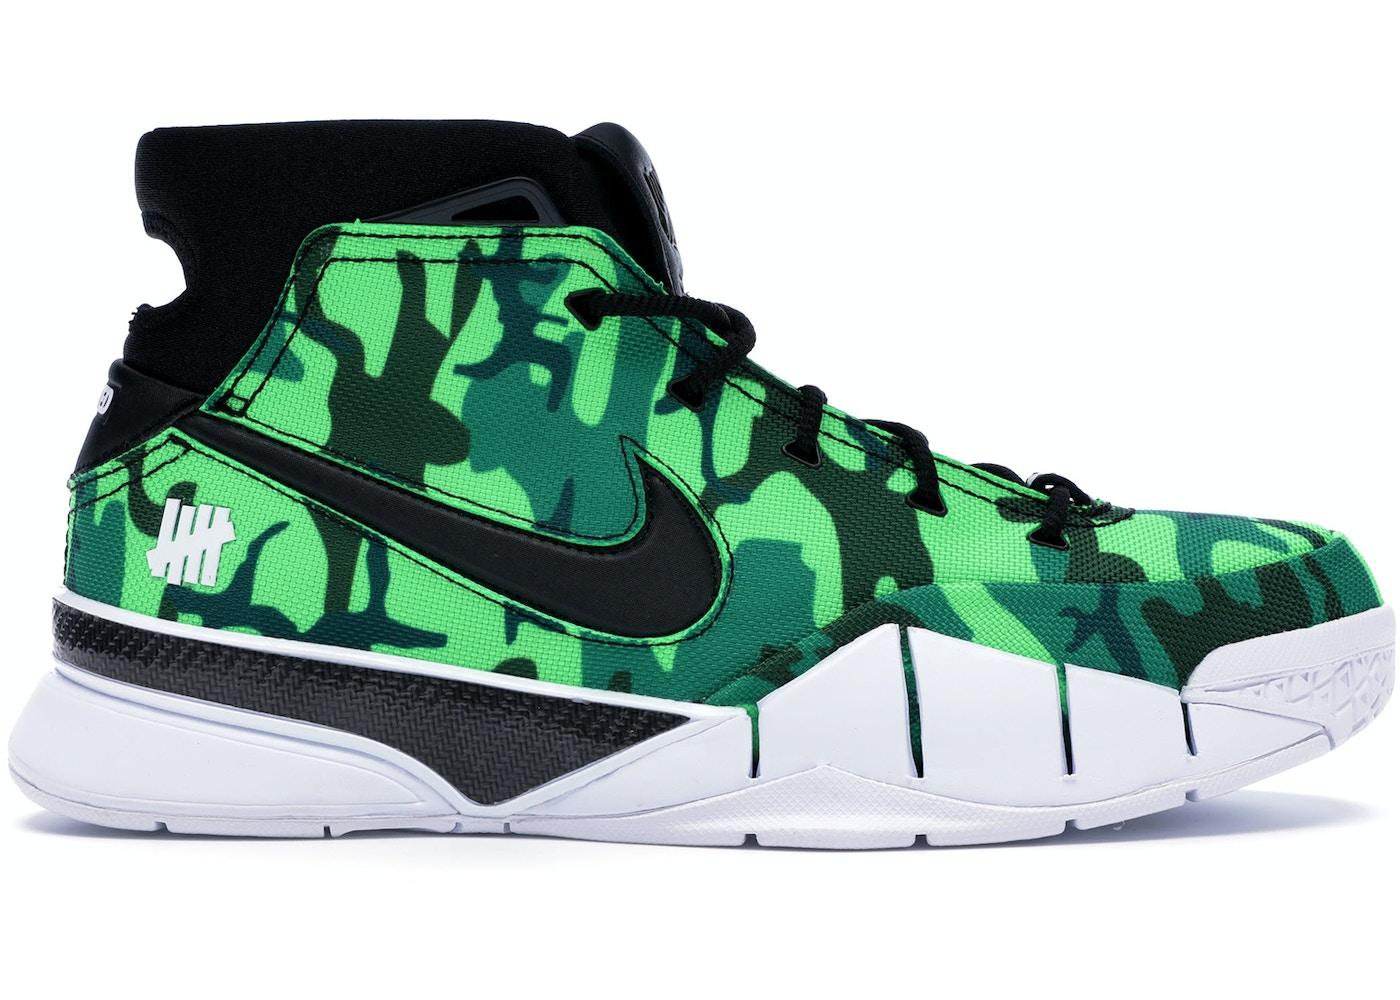 separation shoes 5ee9a ffb60 Buy Nike Kobe 1 Shoes   Deadstock Sneakers